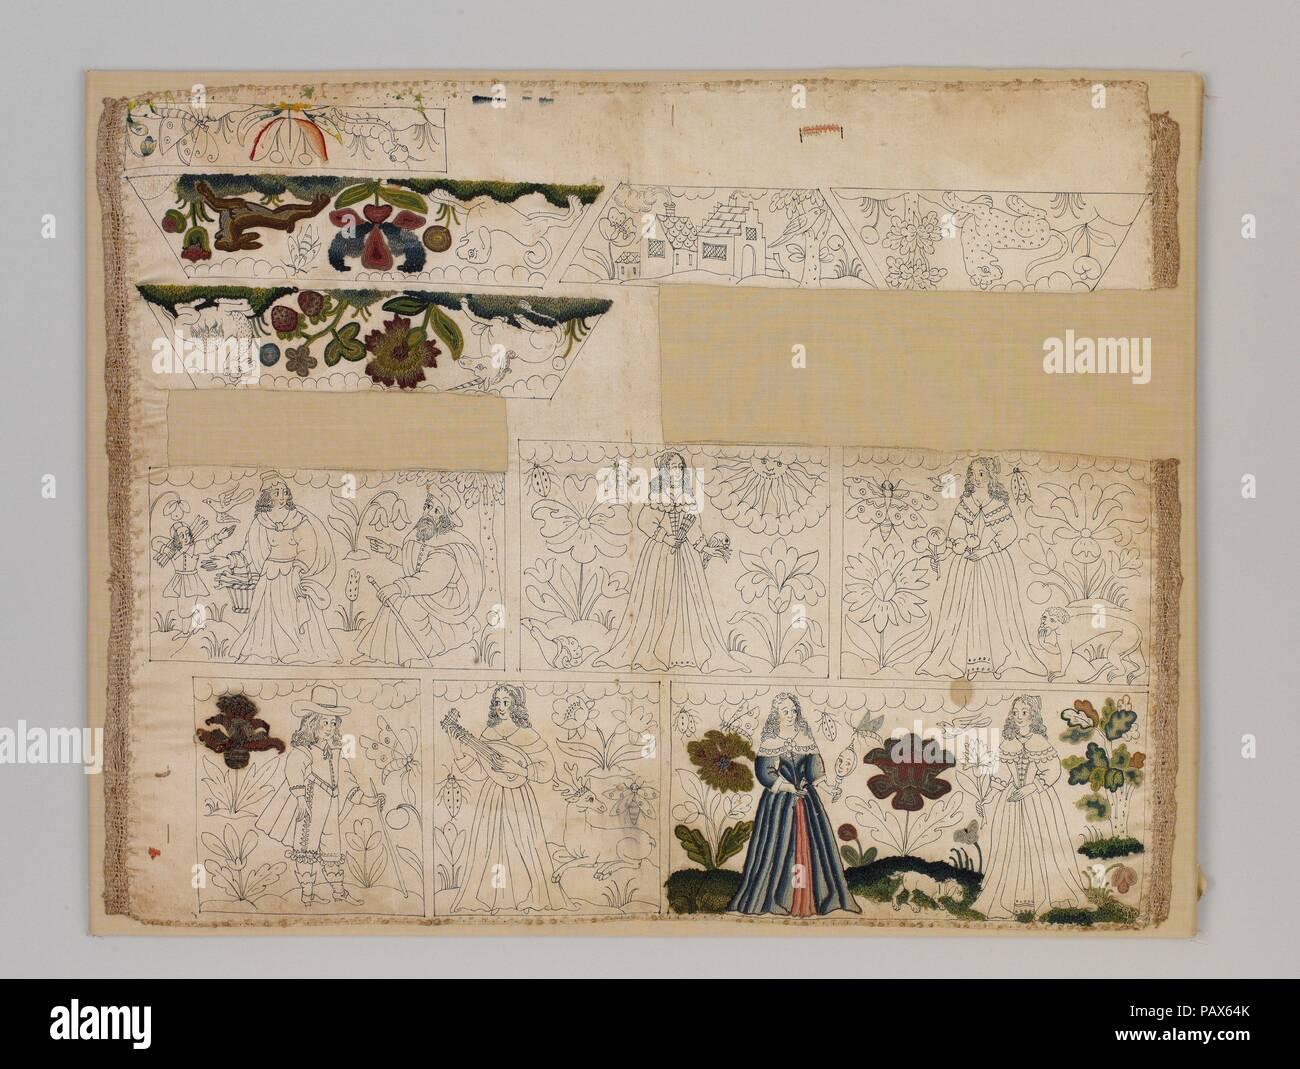 Couching Stitches Imágenes De Stock & Couching Stitches Fotos De ...